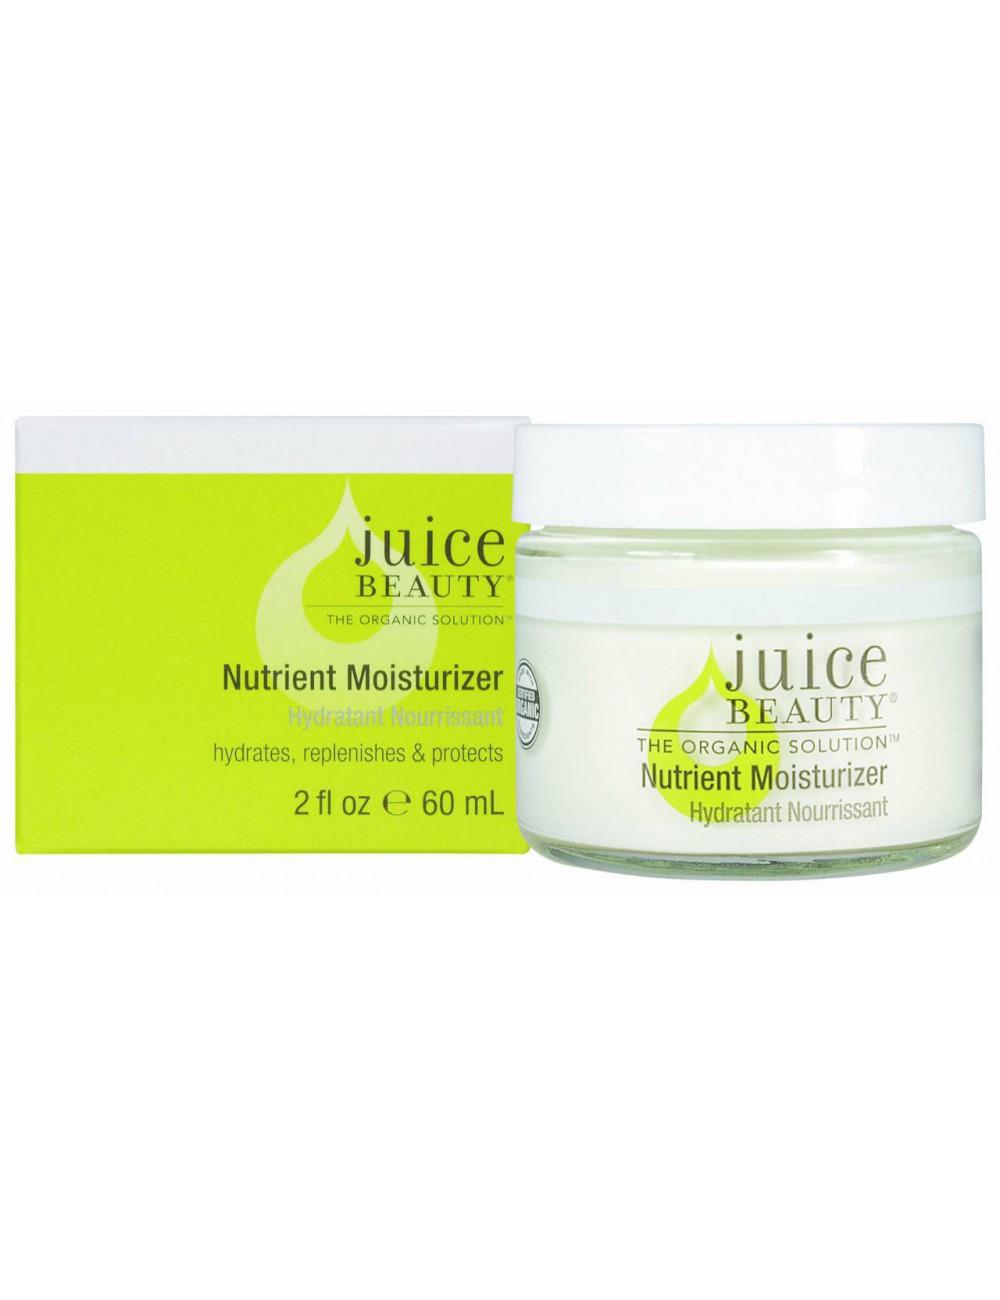 Juice Beauty Daily Essentials Nutrient Moisturizer 60ml